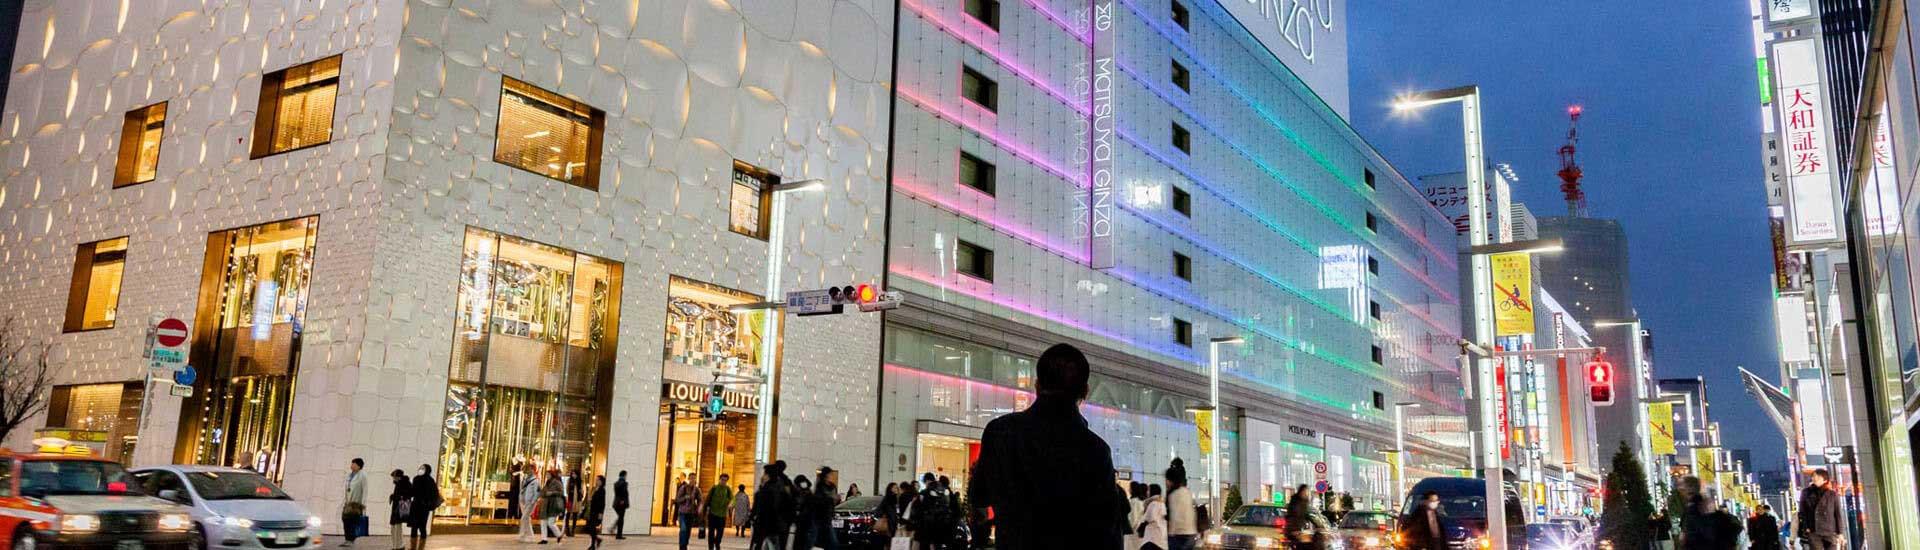 Tokyo, Image of Shopping